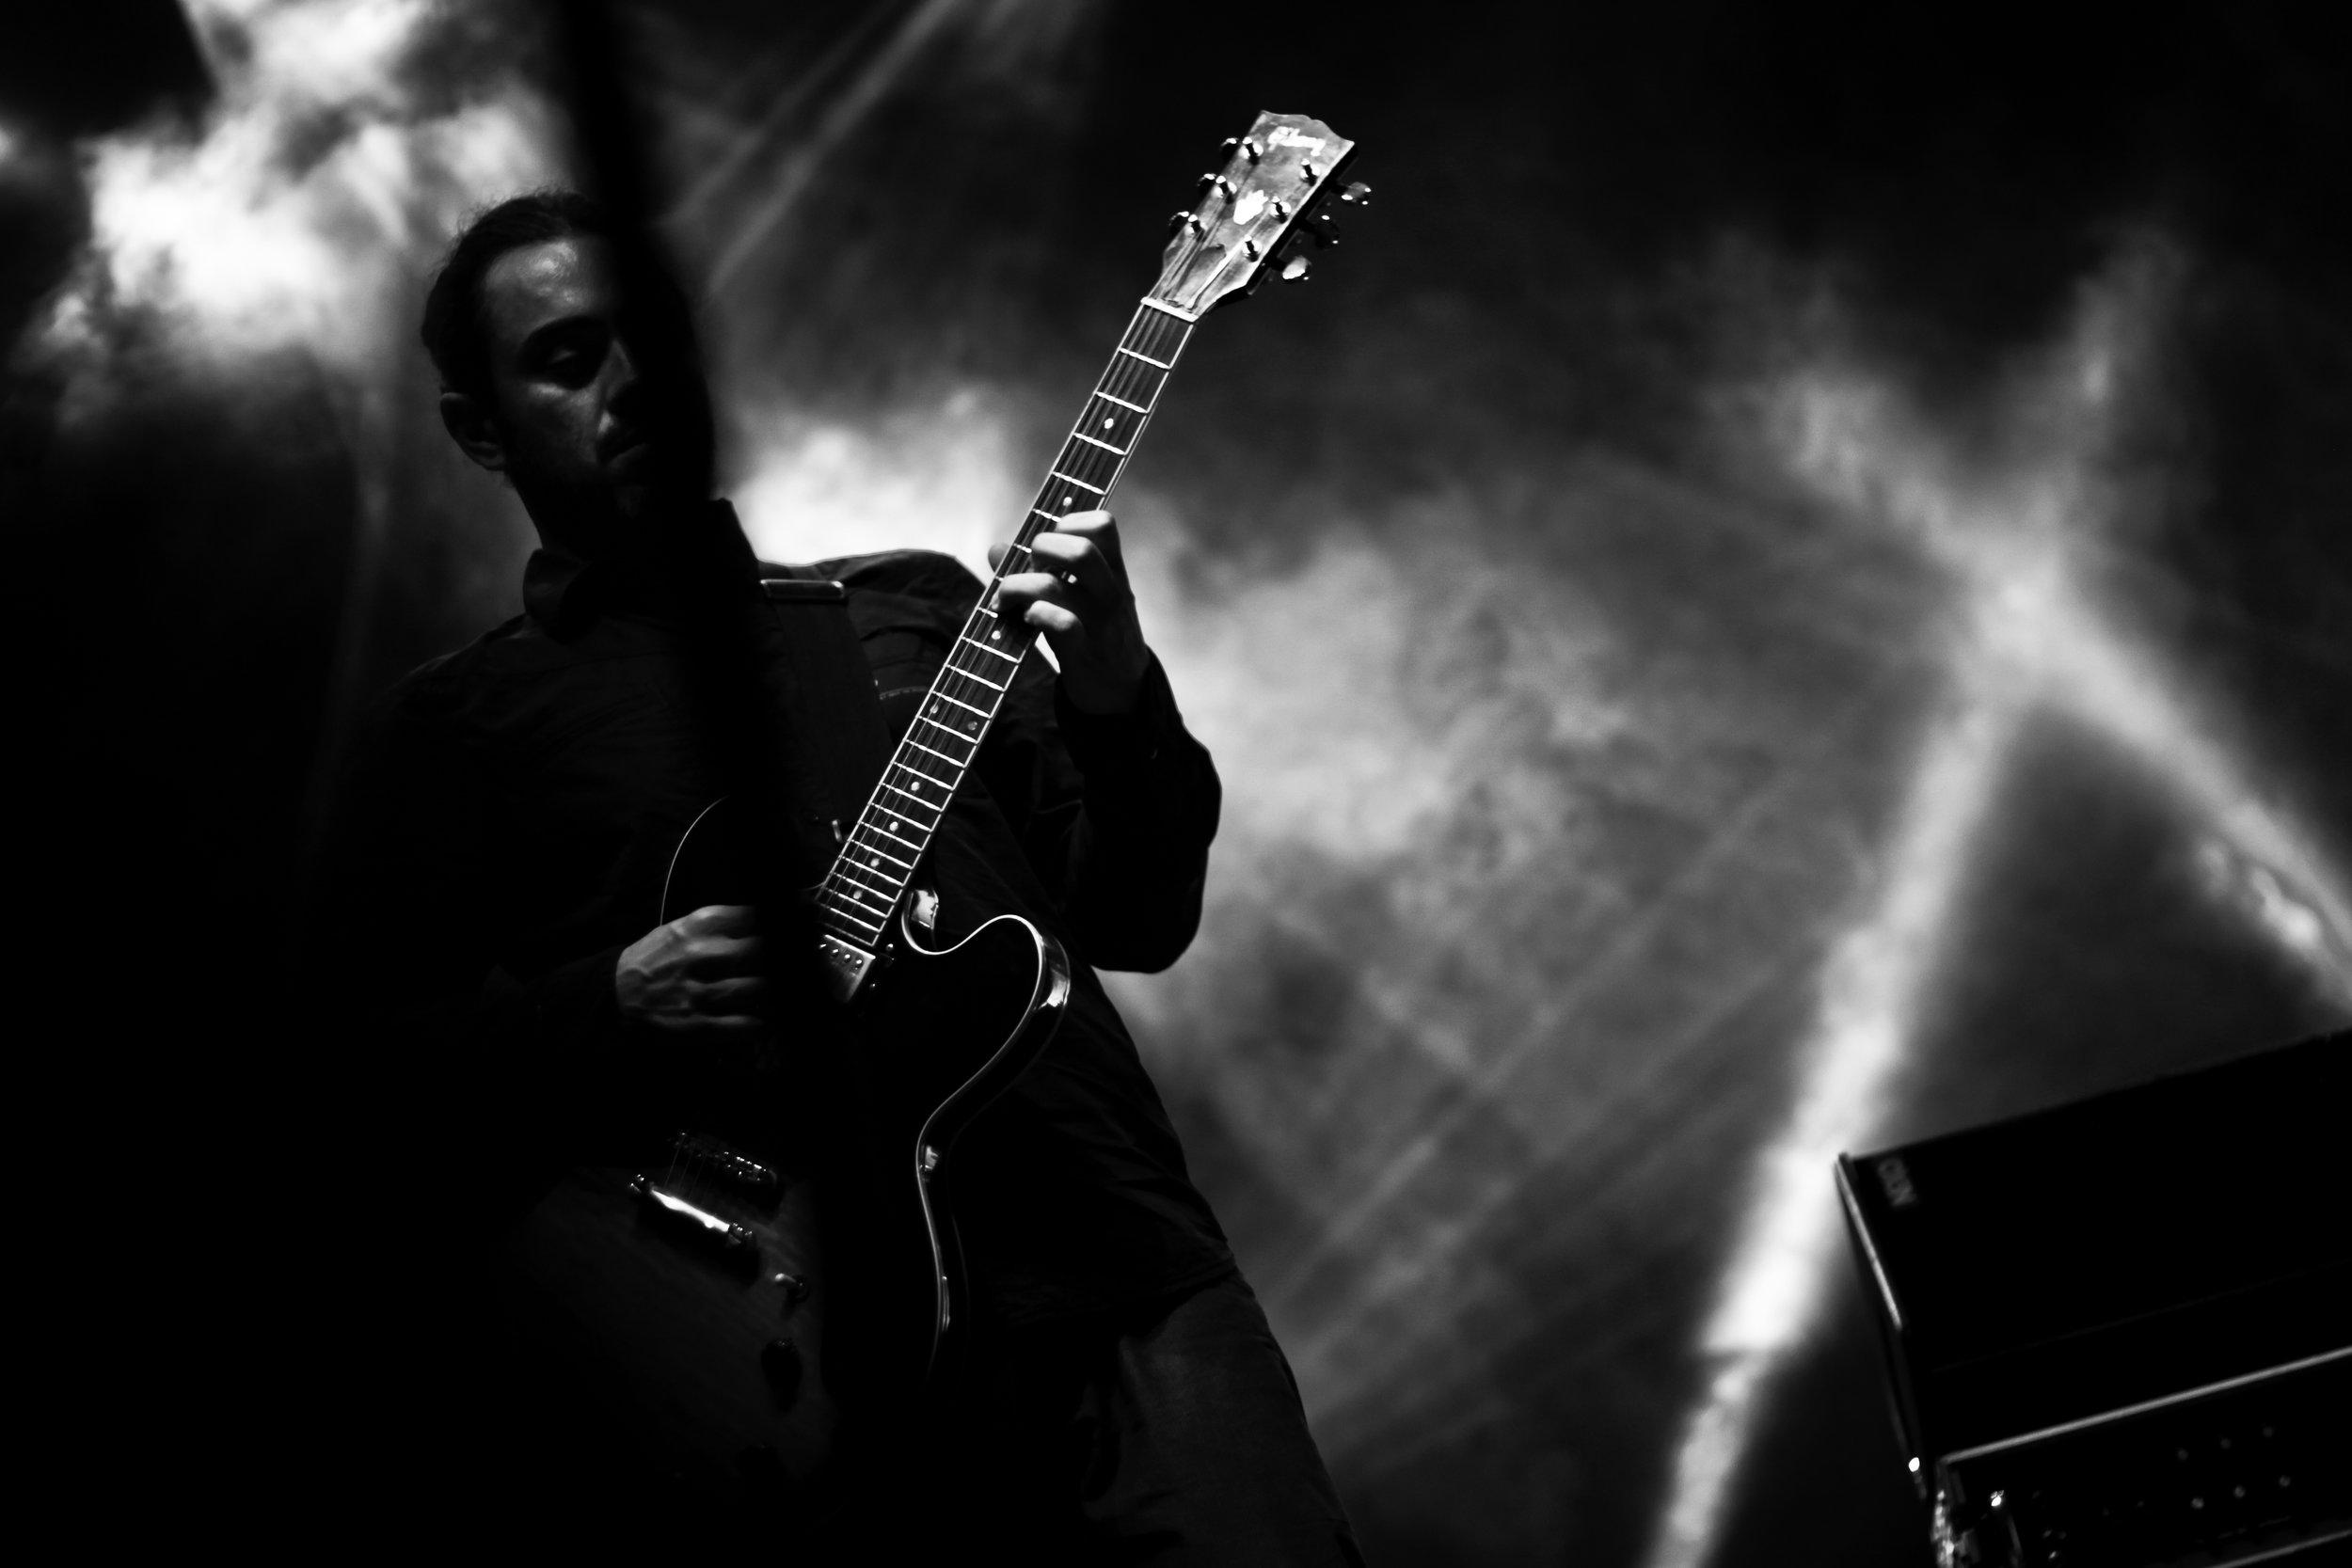 © Francisco Gallardo (Festival Internacional de Providencia 2014)